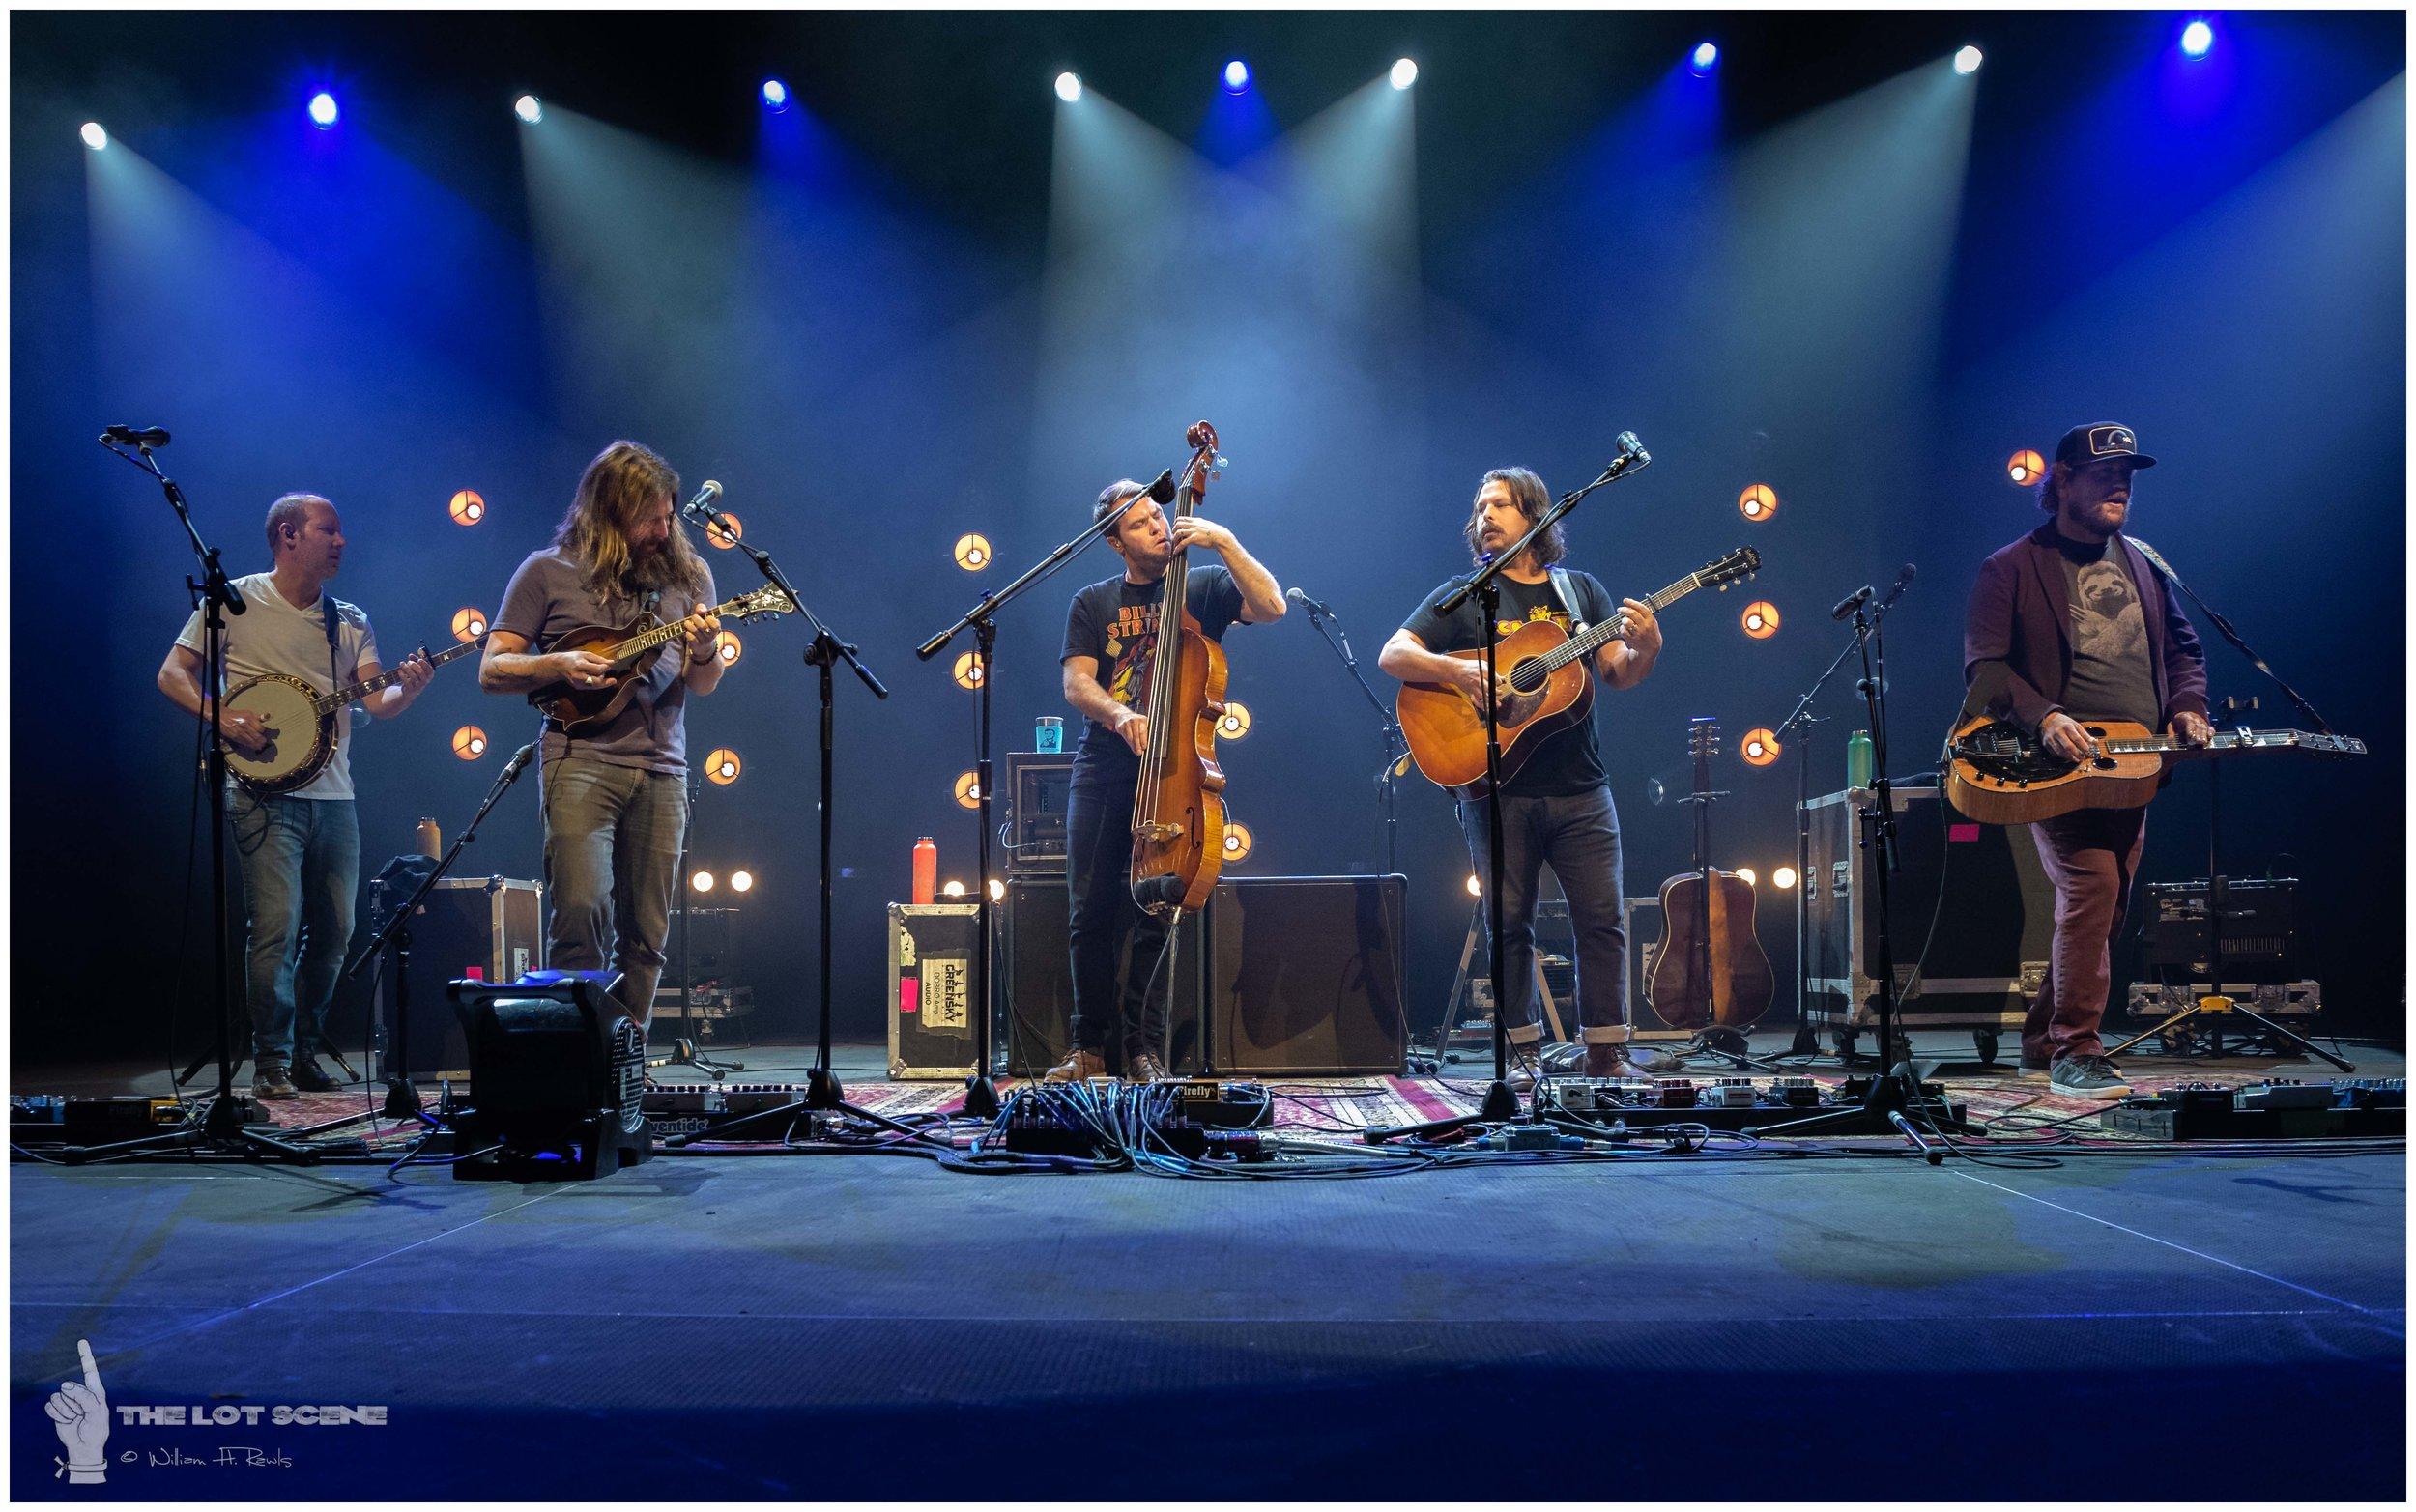 Greensky Bluegrass at The Anthem DC - February 2 2019 - 12.jpg